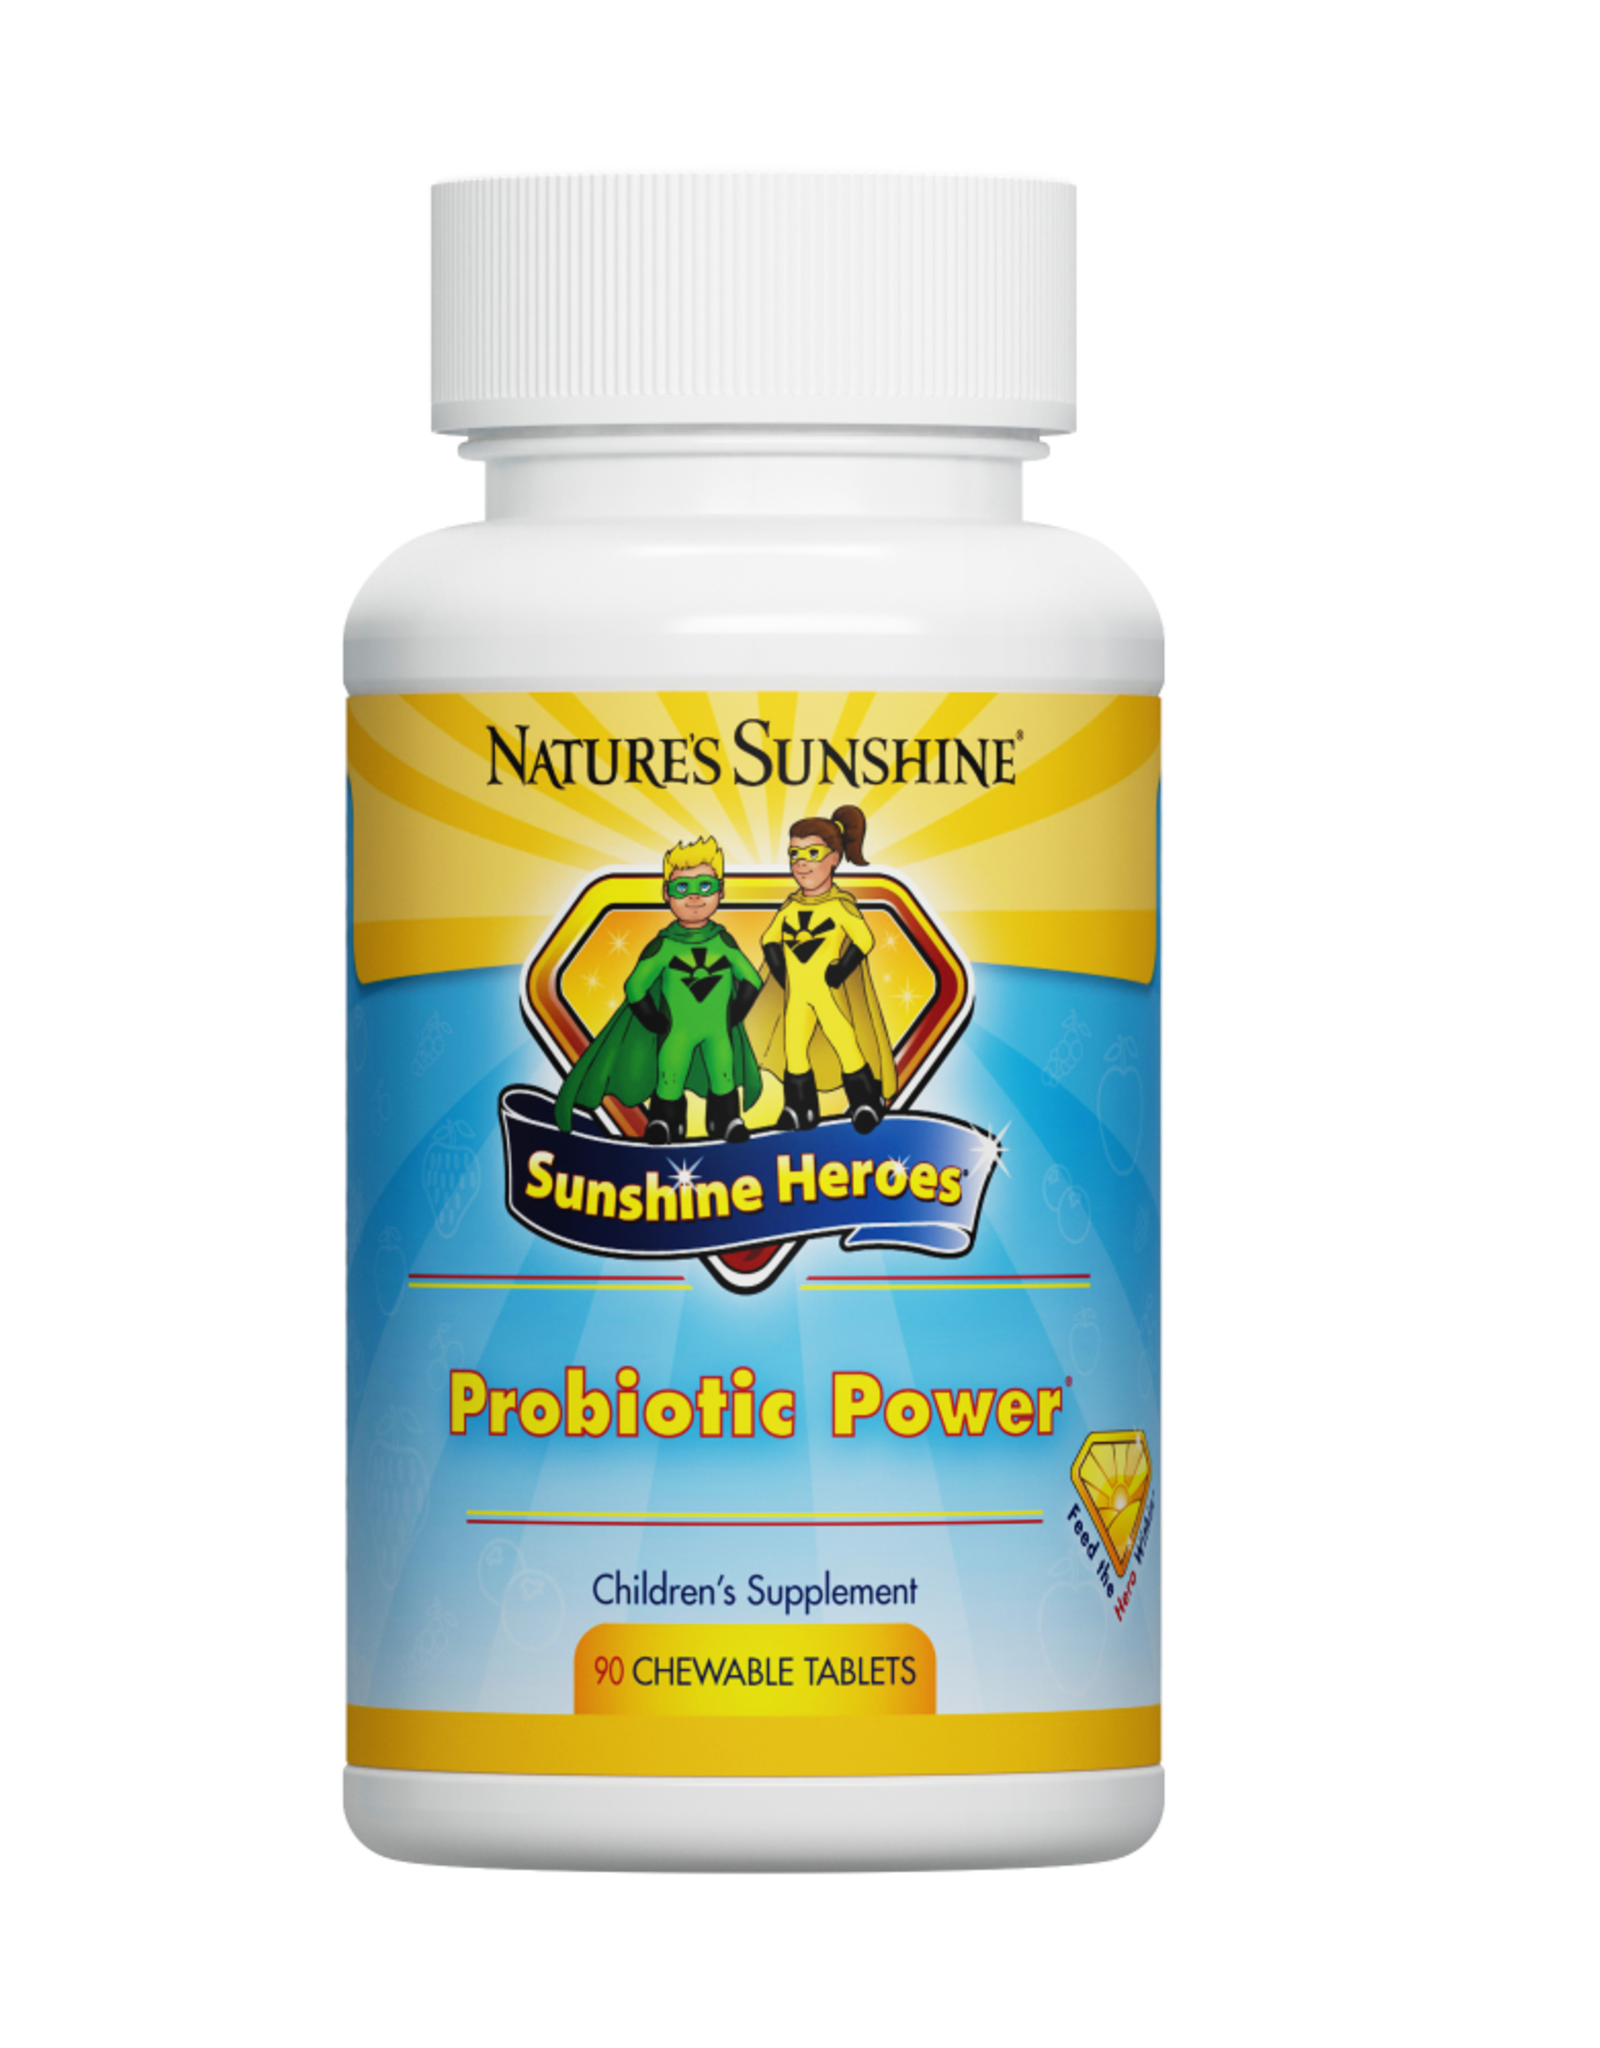 Nature's Sunshine Probiotic Power (90 chewable tablets)